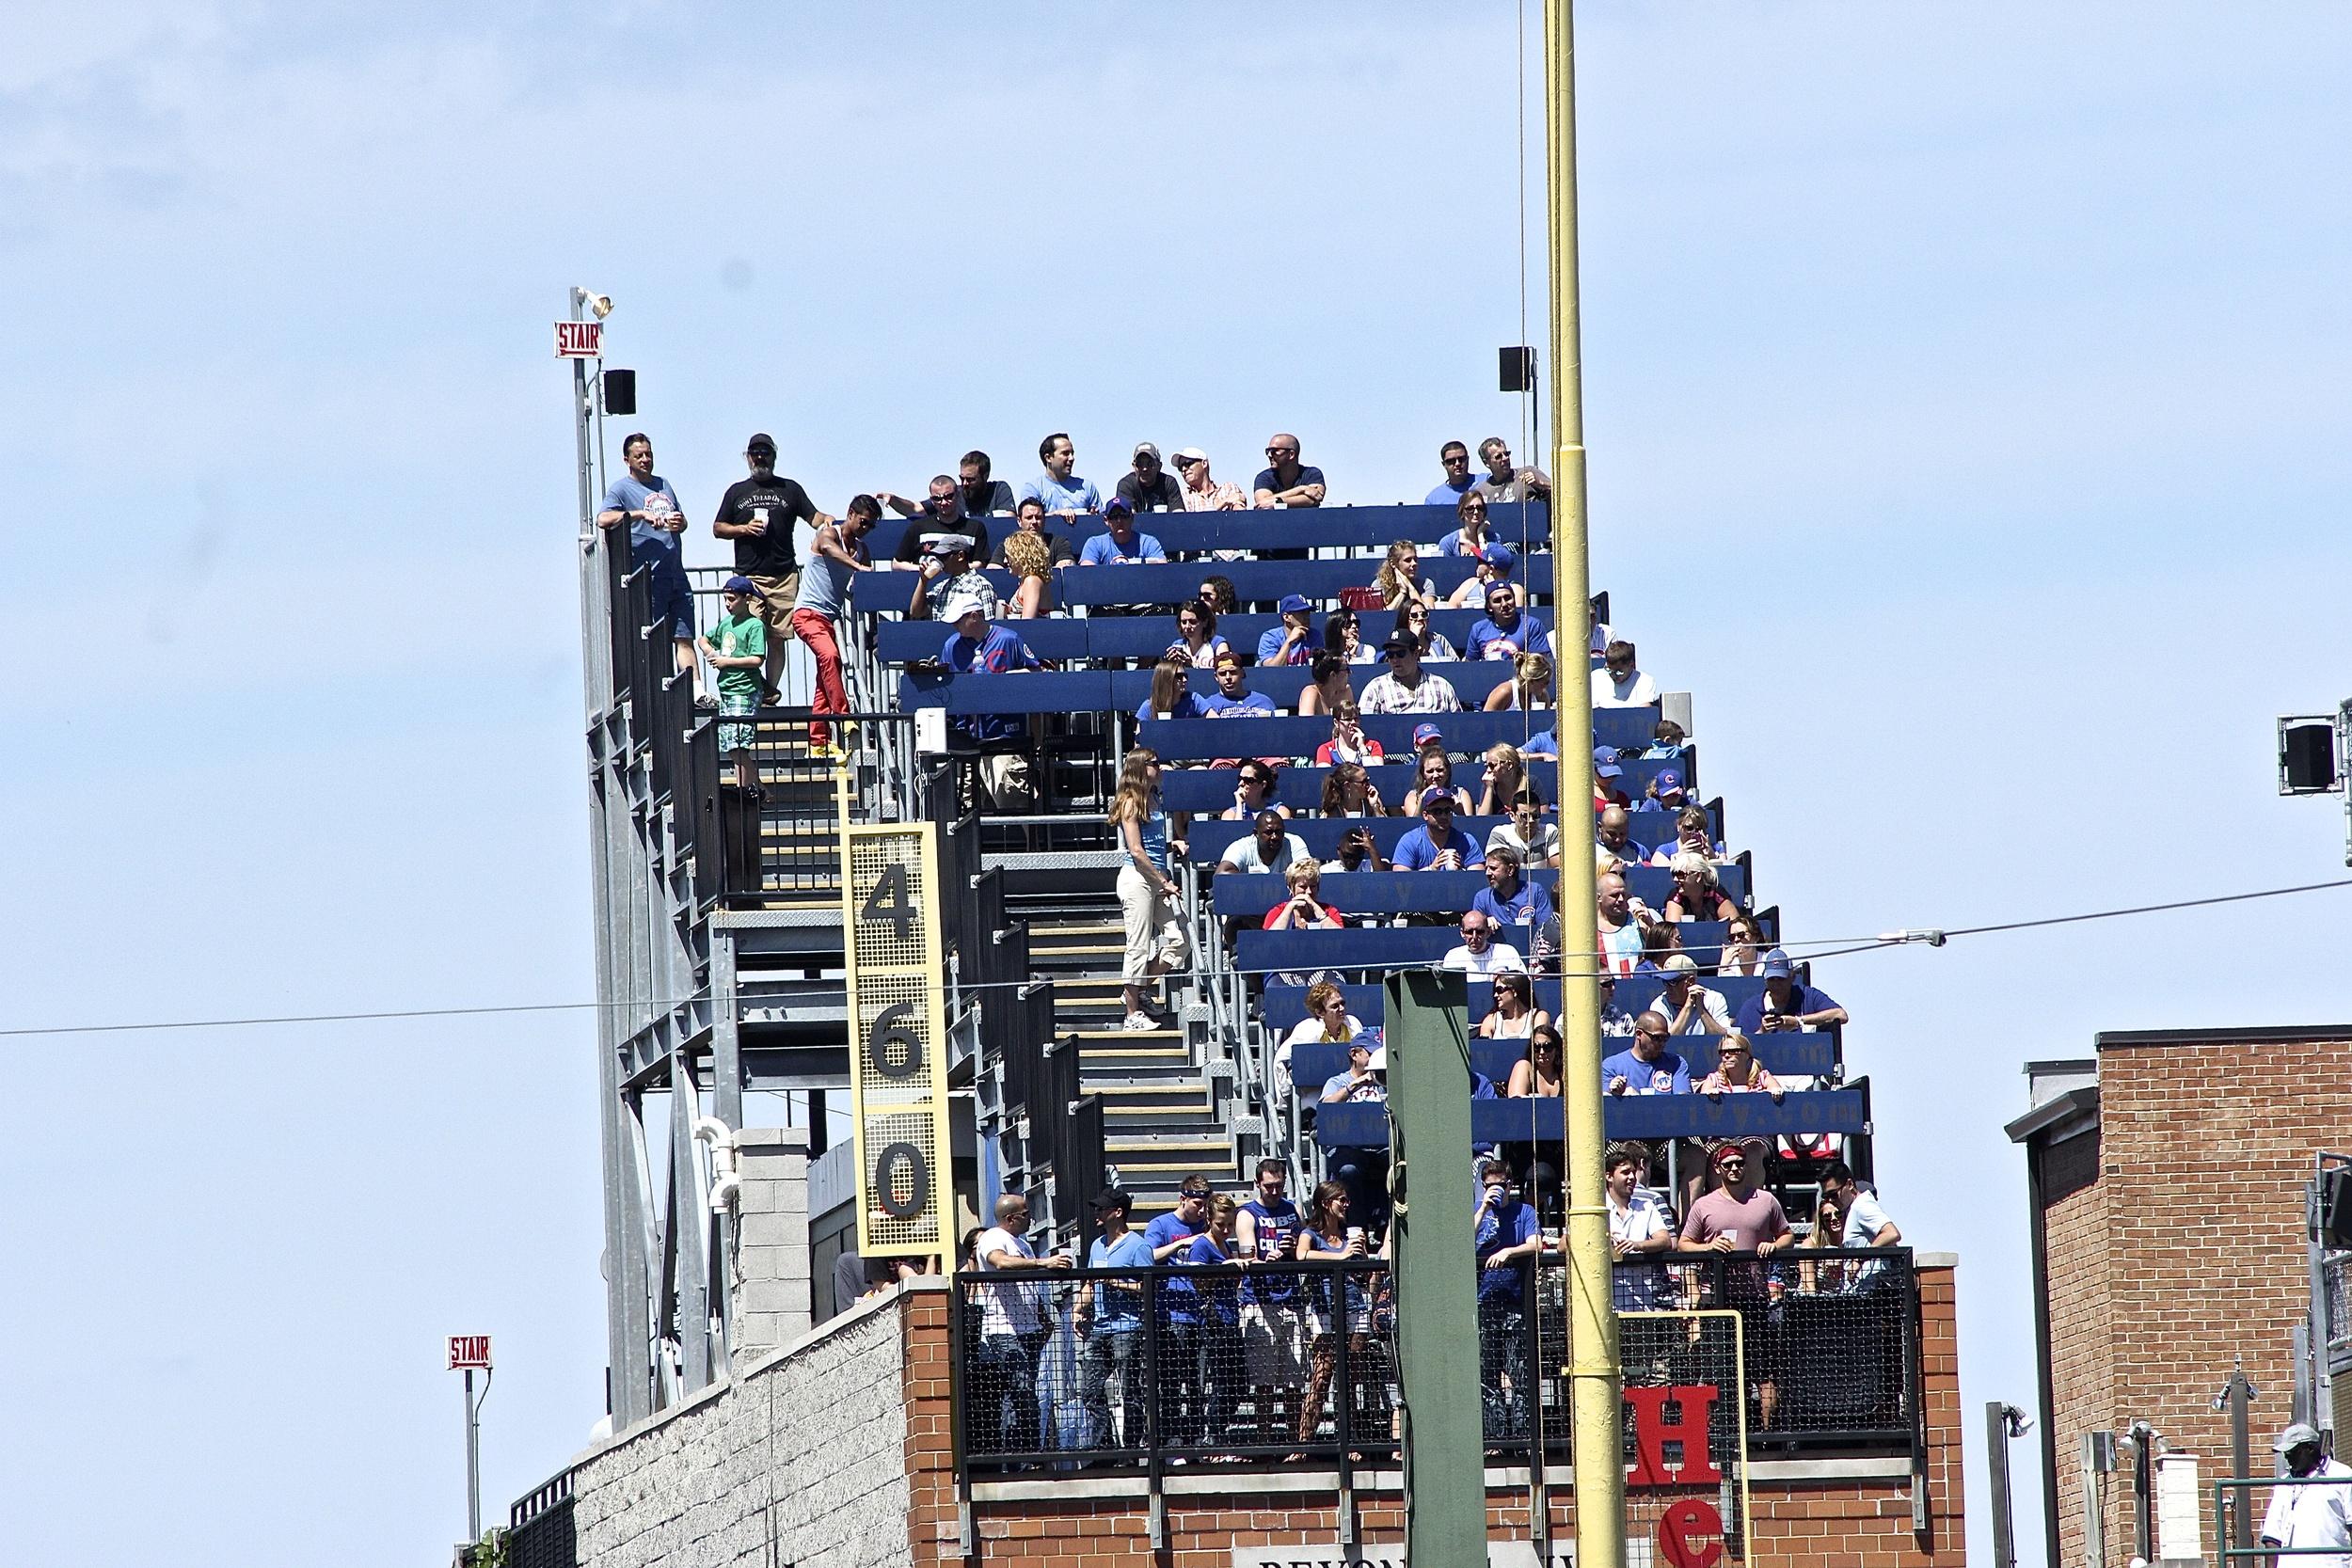 Rooftop seats